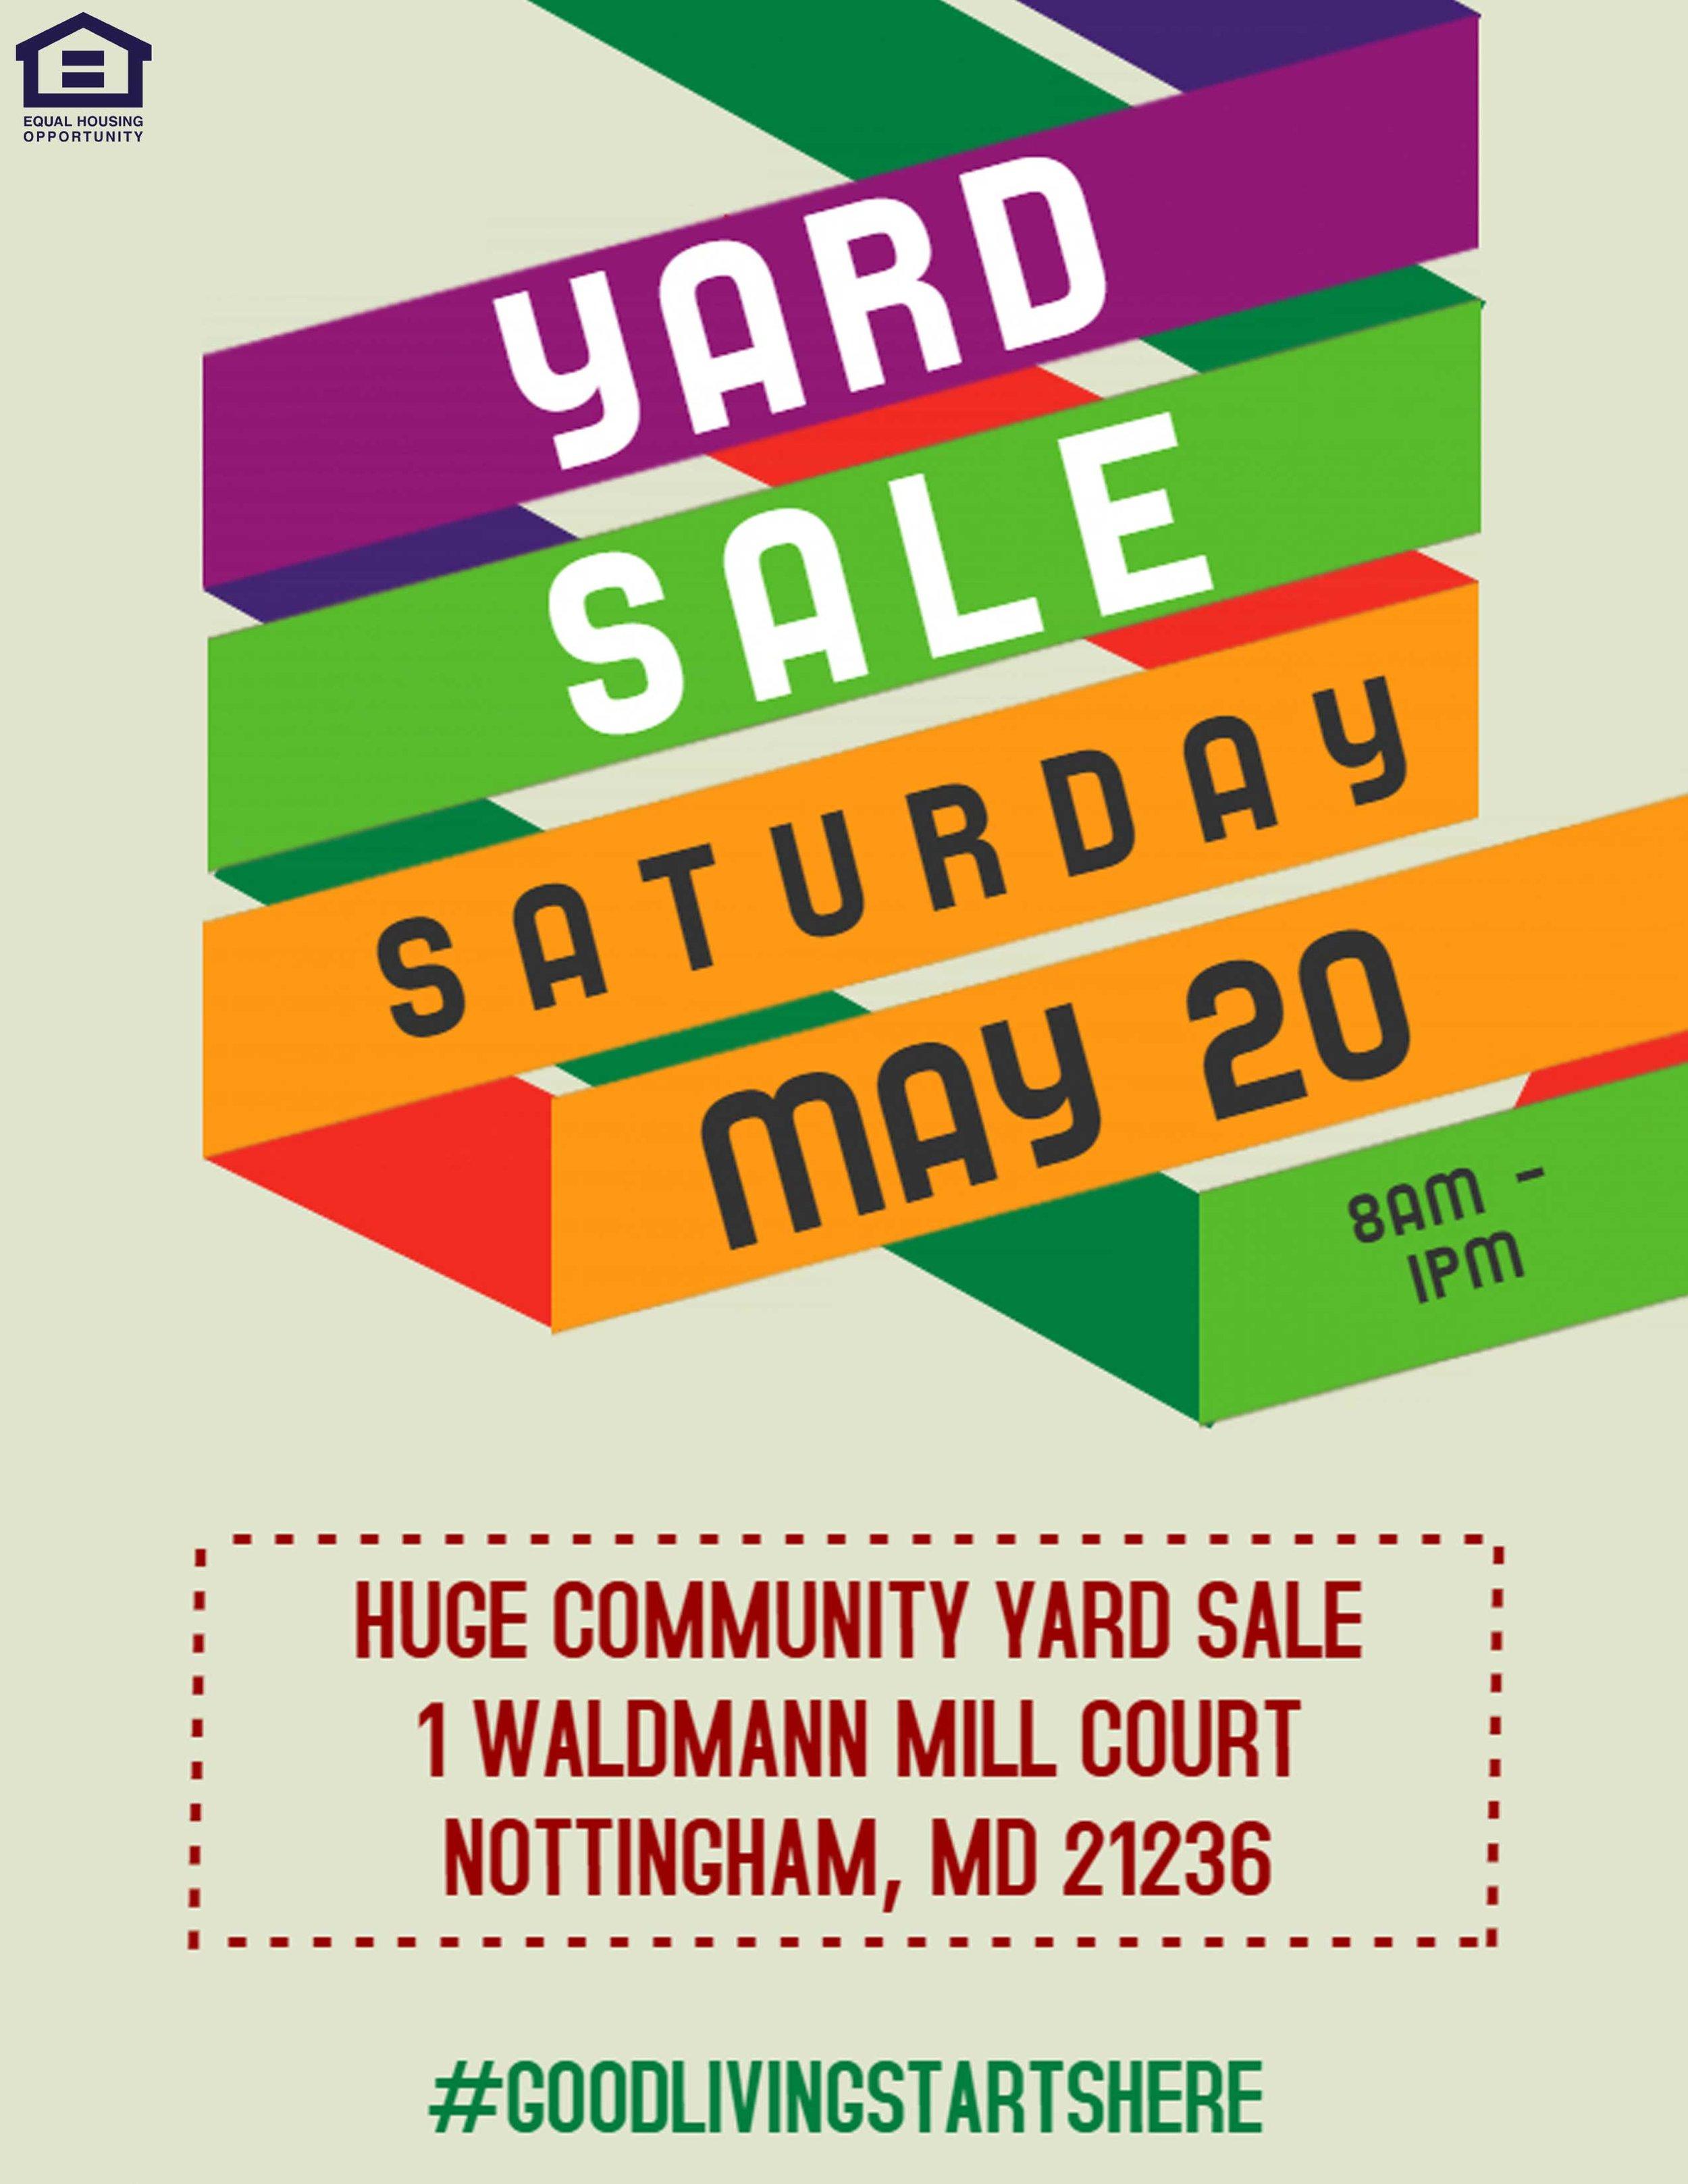 Olde-Forge-&-Hallfield-Yard-Sale---Community-Poster.jpg